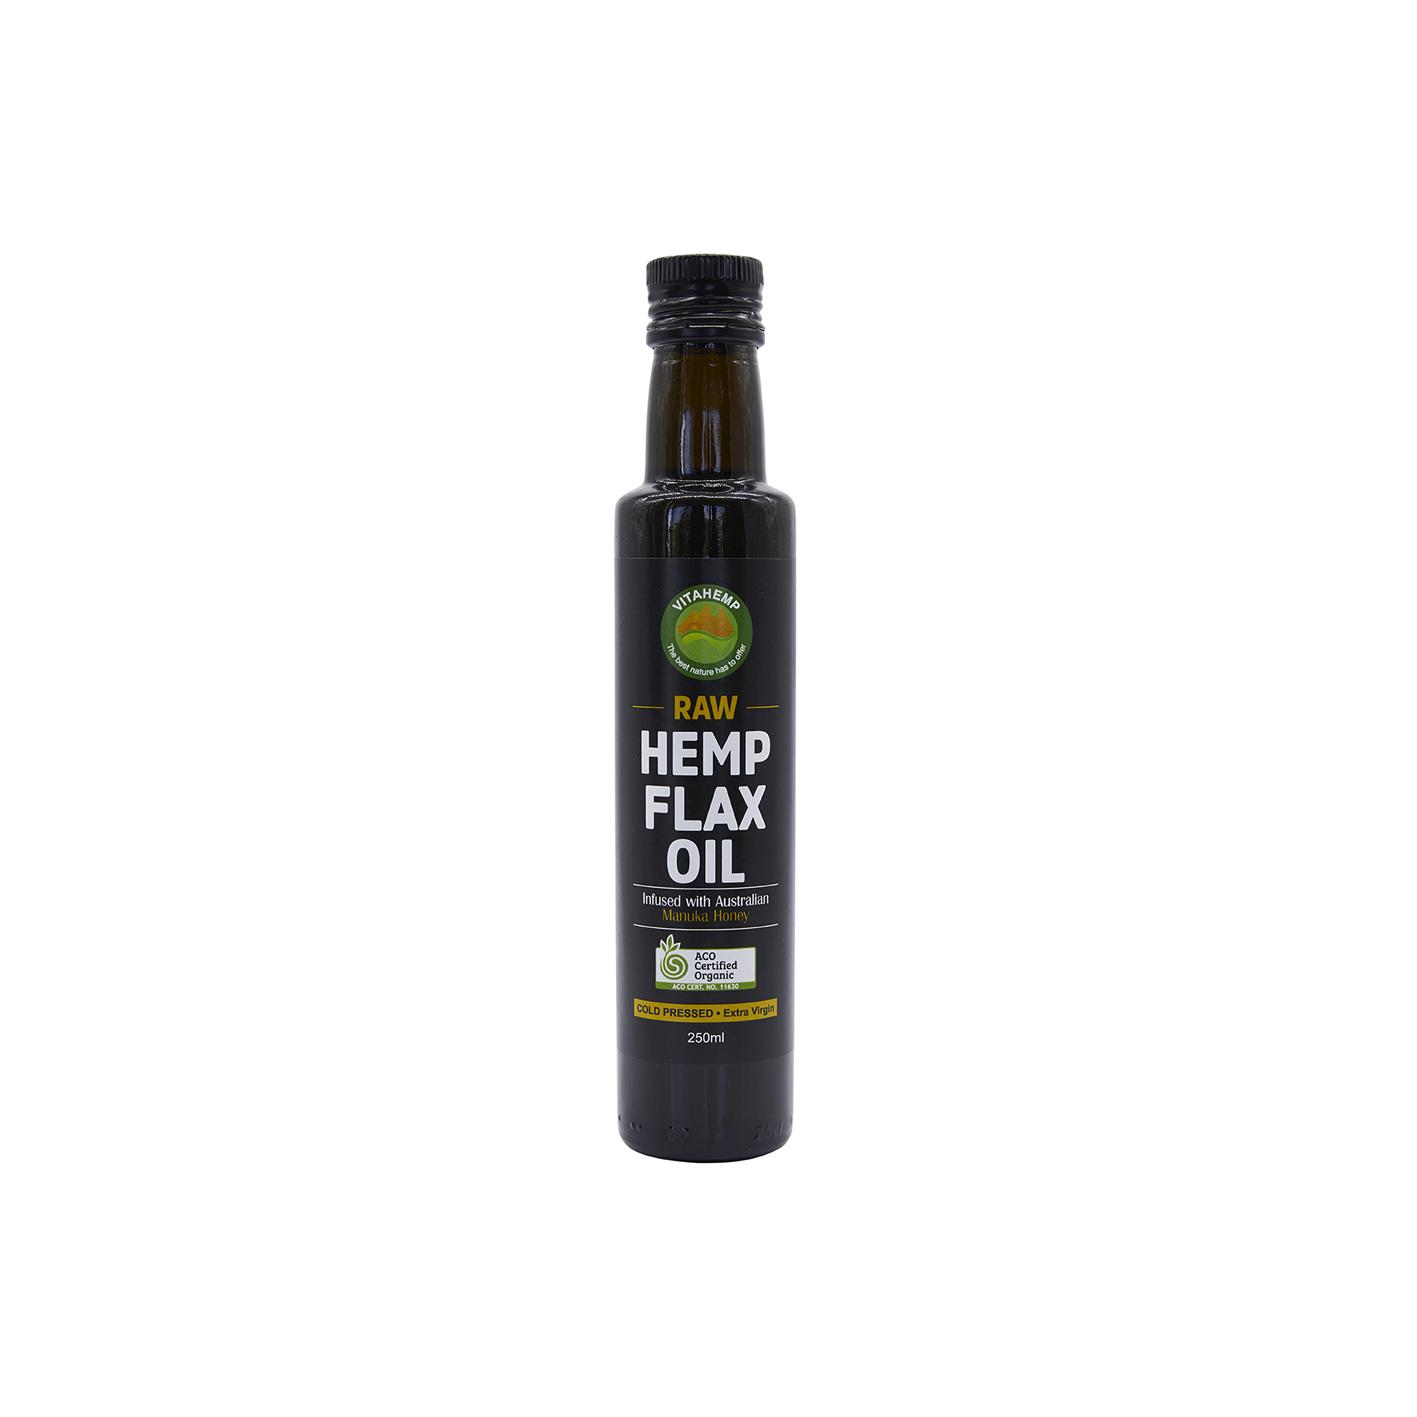 Certfied Organic Hemp & Flax Seed/Manuka Honey Oil 250ml